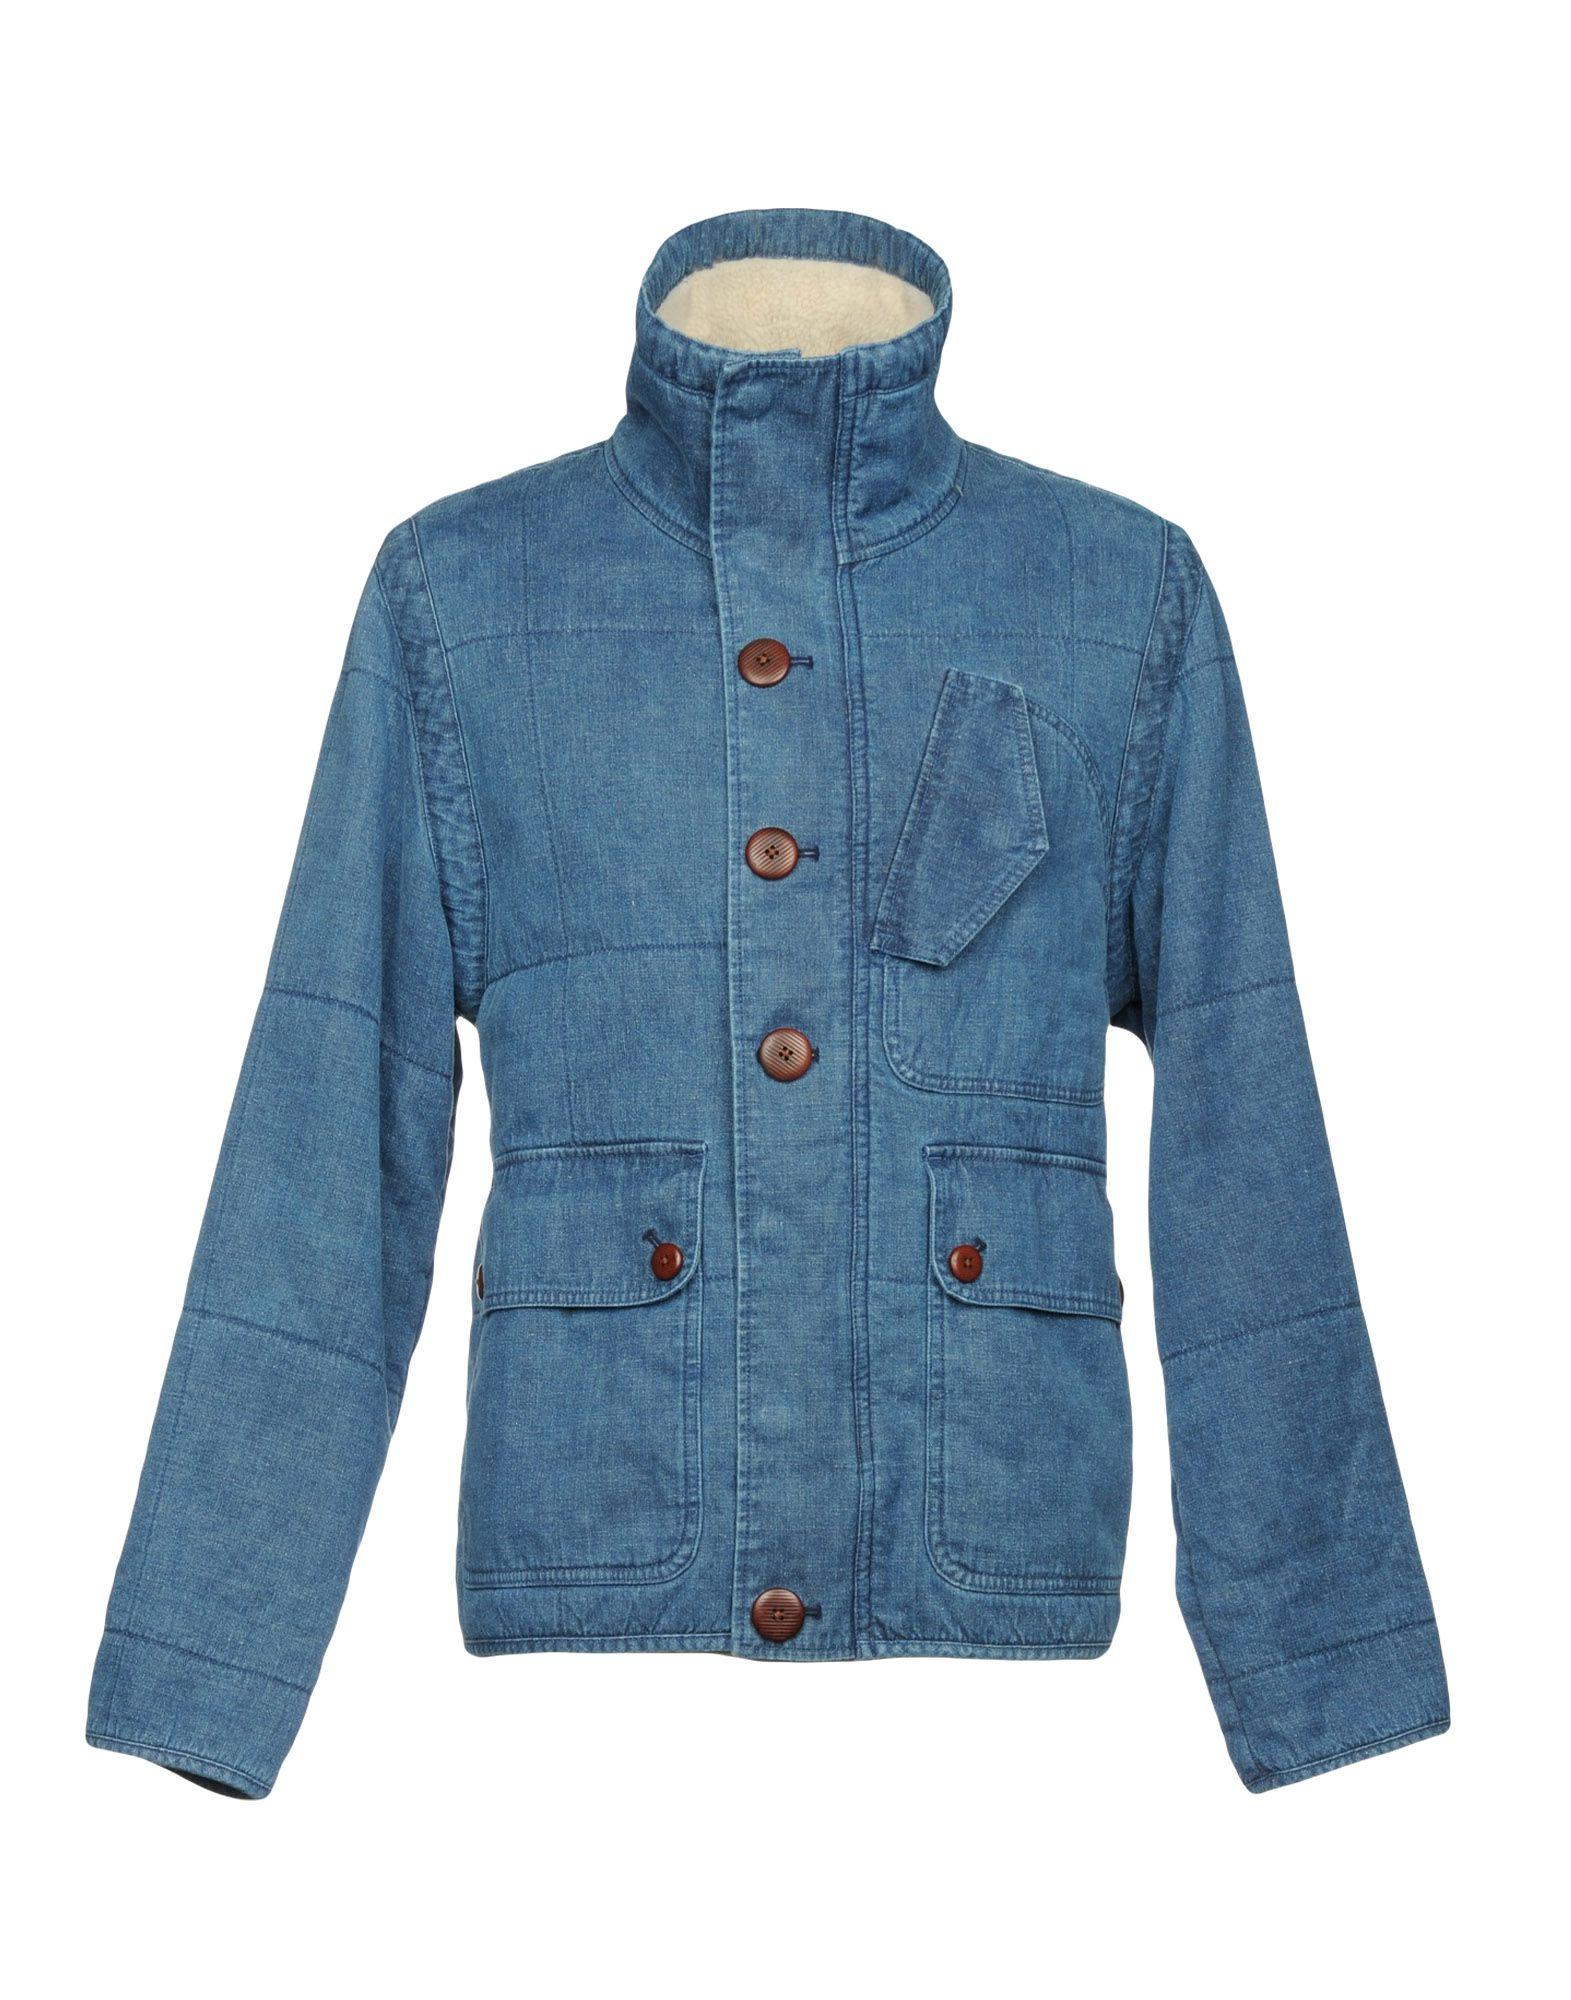 Giubbotto Jeans Outerknown Uomo - Acquista online su